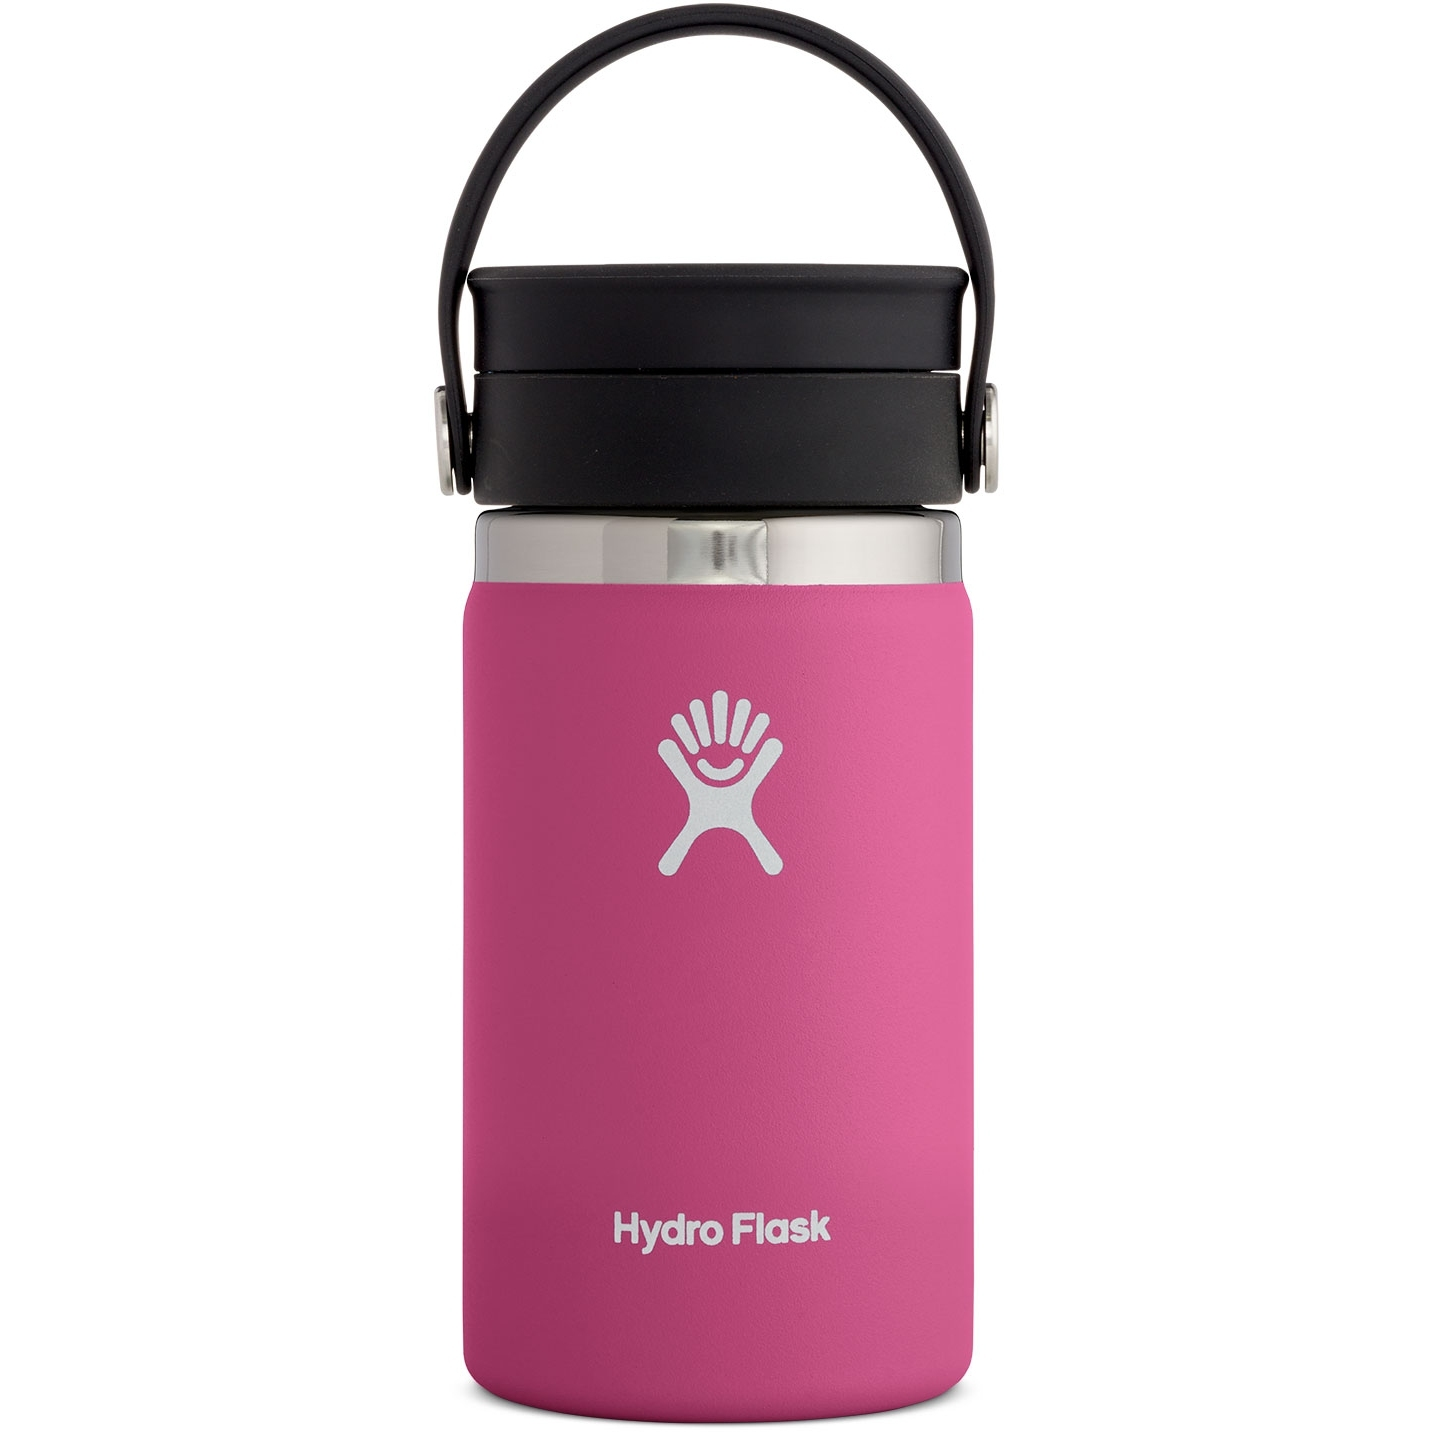 Hydro Flask 12oz Coffee Flex Sip™ Lid Thermoflasche - 355ml - Carnation